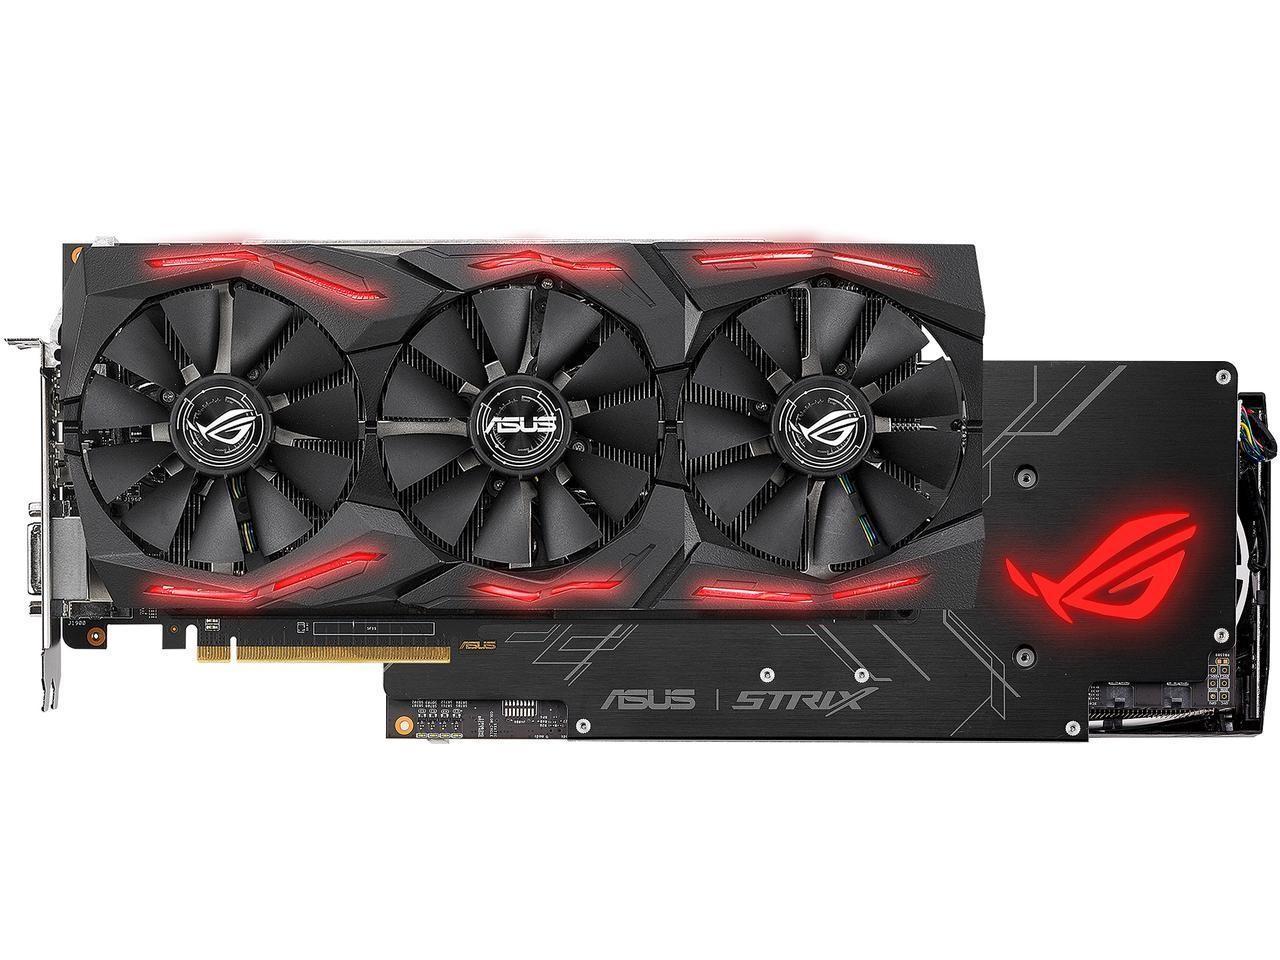 Image 1 of Asus Rog Strix Radeon Rx Vega64 8gb Oc Edition Vr Ready 5k Hd Gaming Dp Hdmi Dvi Amd Gaming Graphics ROG-STRIX-RXVEGA64-O8G-GAMING